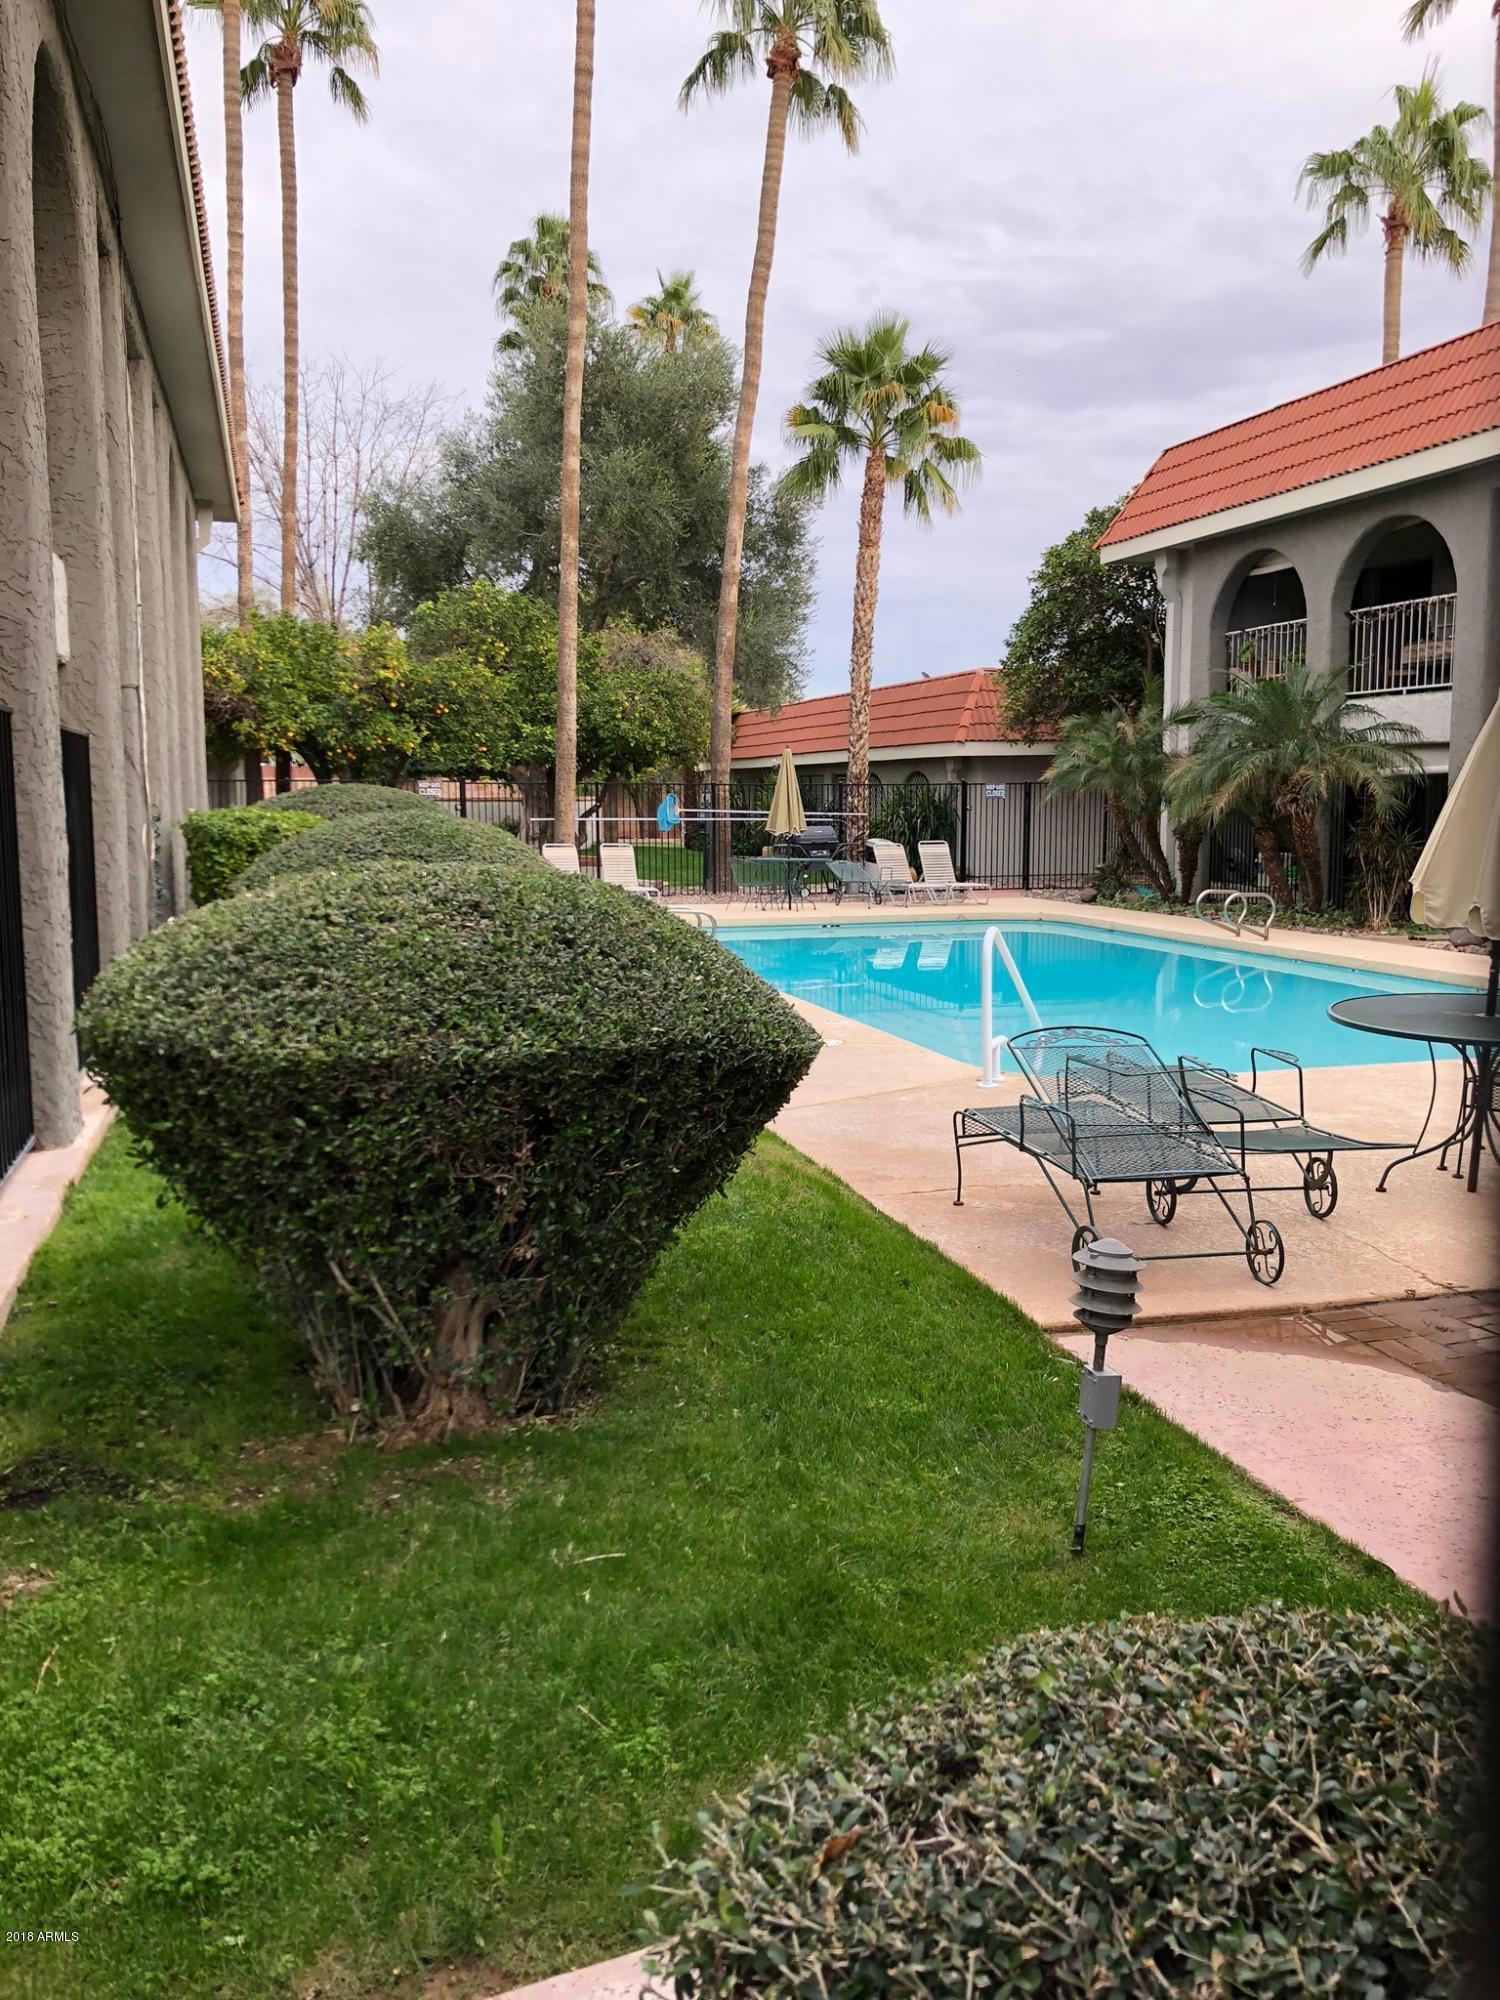 1650 N 87TH Terrace Unit 7 Scottsdale, AZ 85257 - MLS #: 5857415